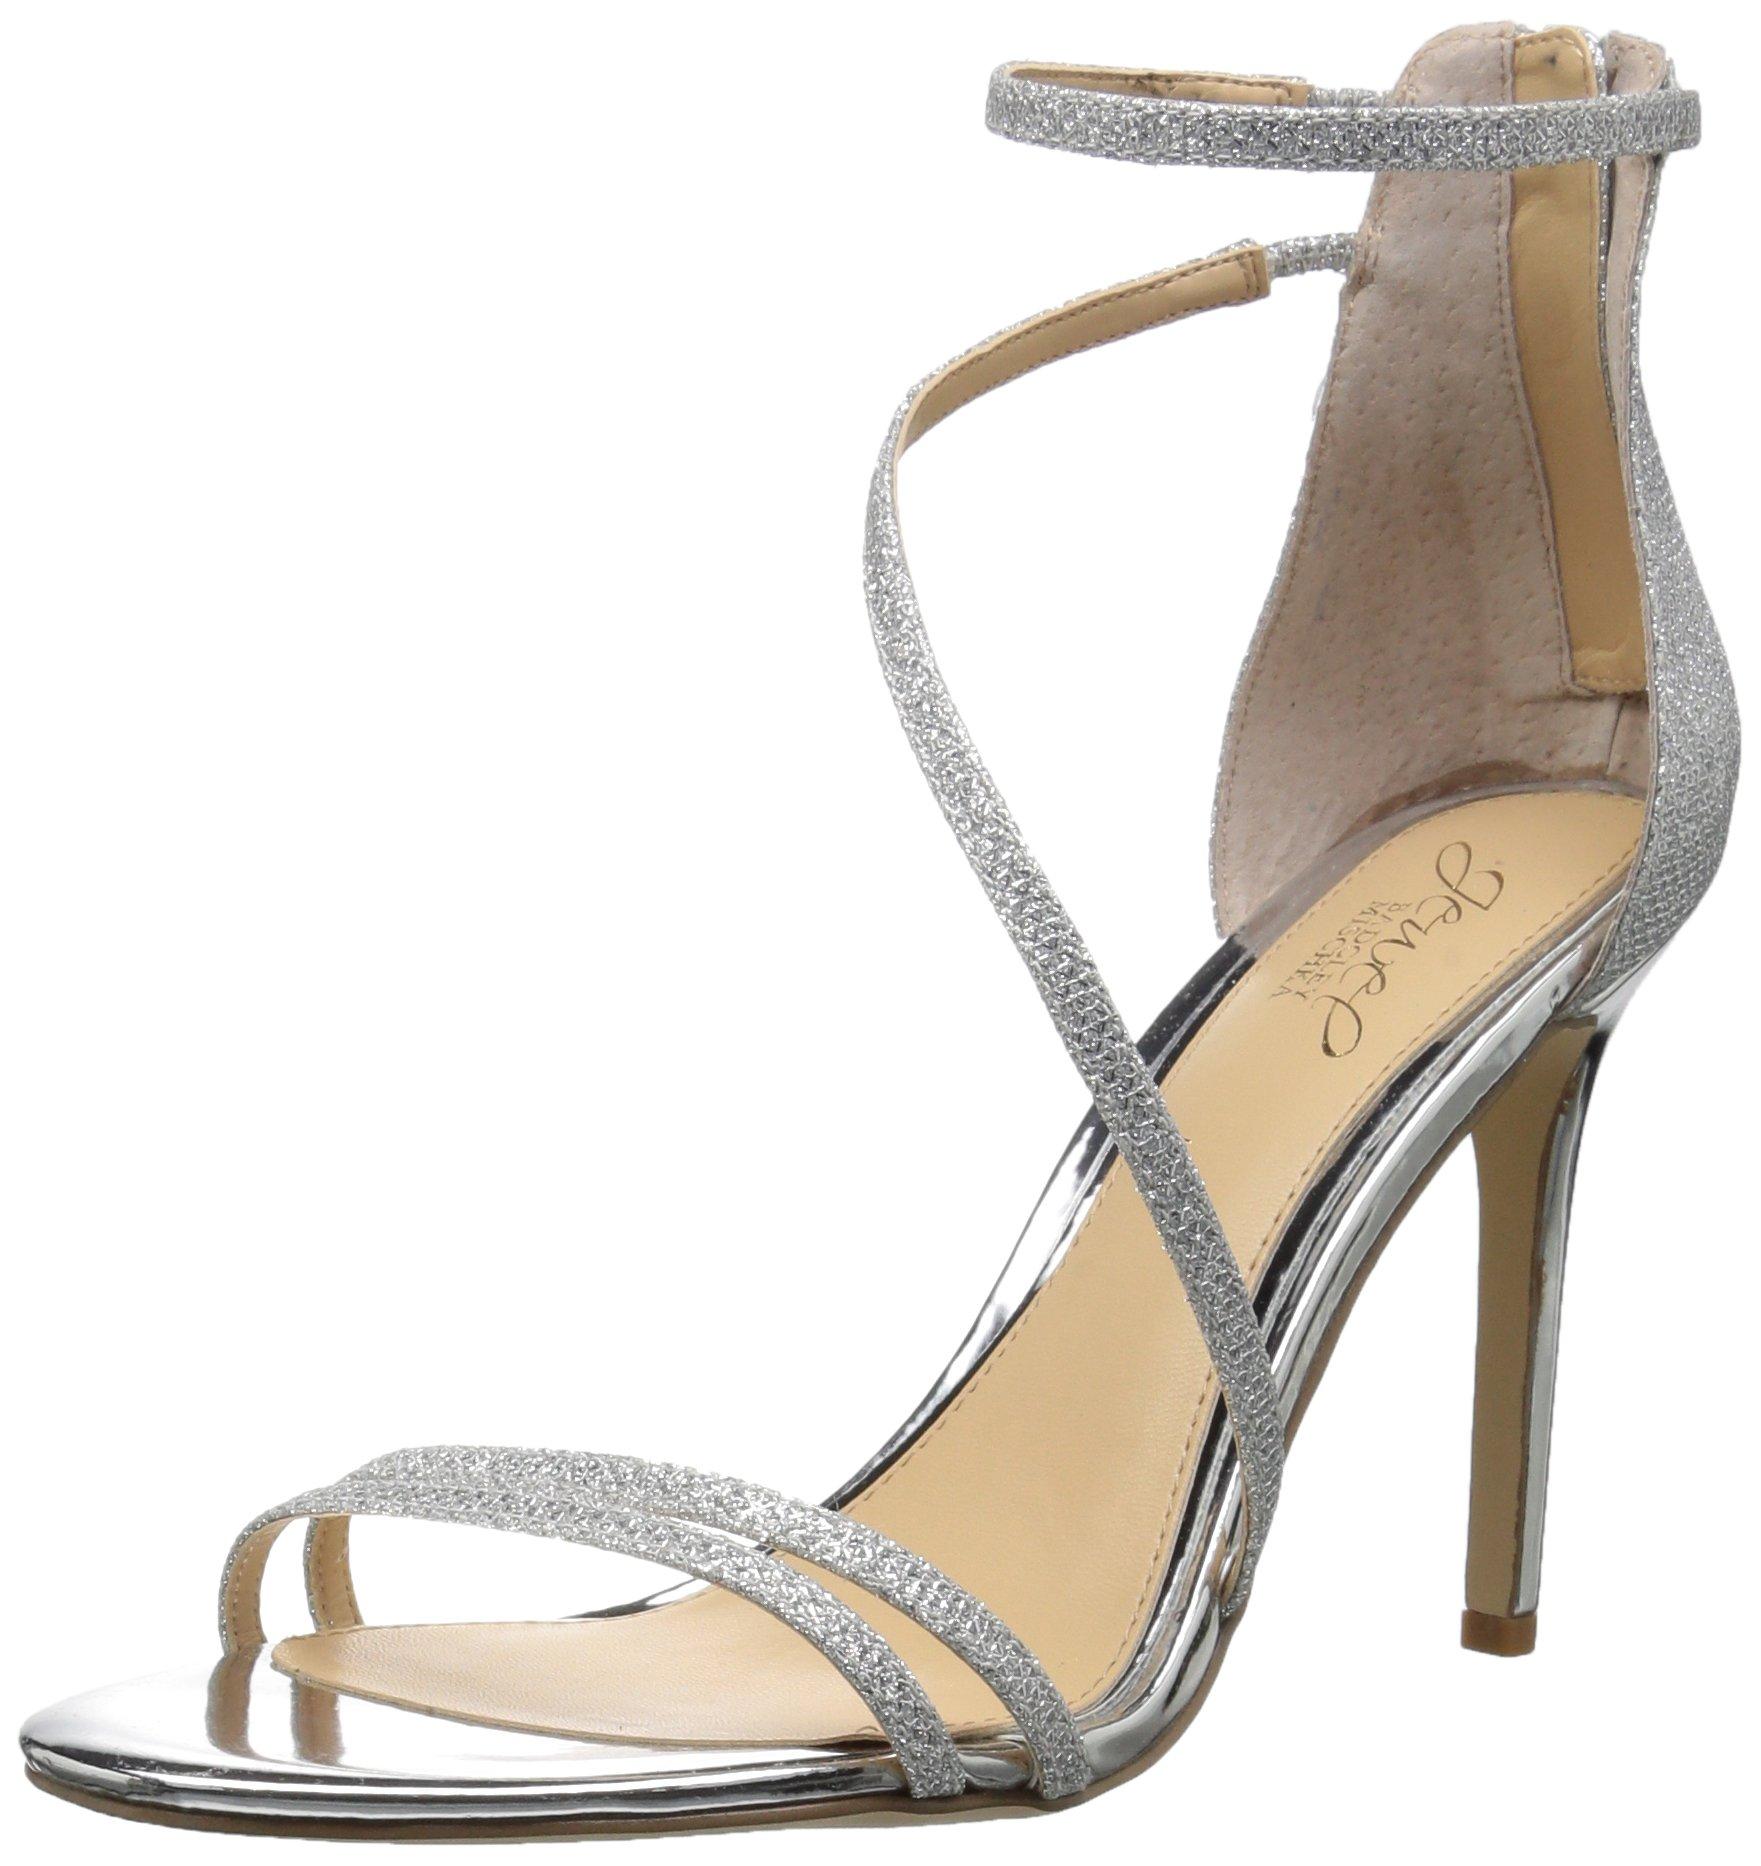 Badgley Mischka Jewel Women's Gail Heeled Sandal, Silver, 9.5 Medium US